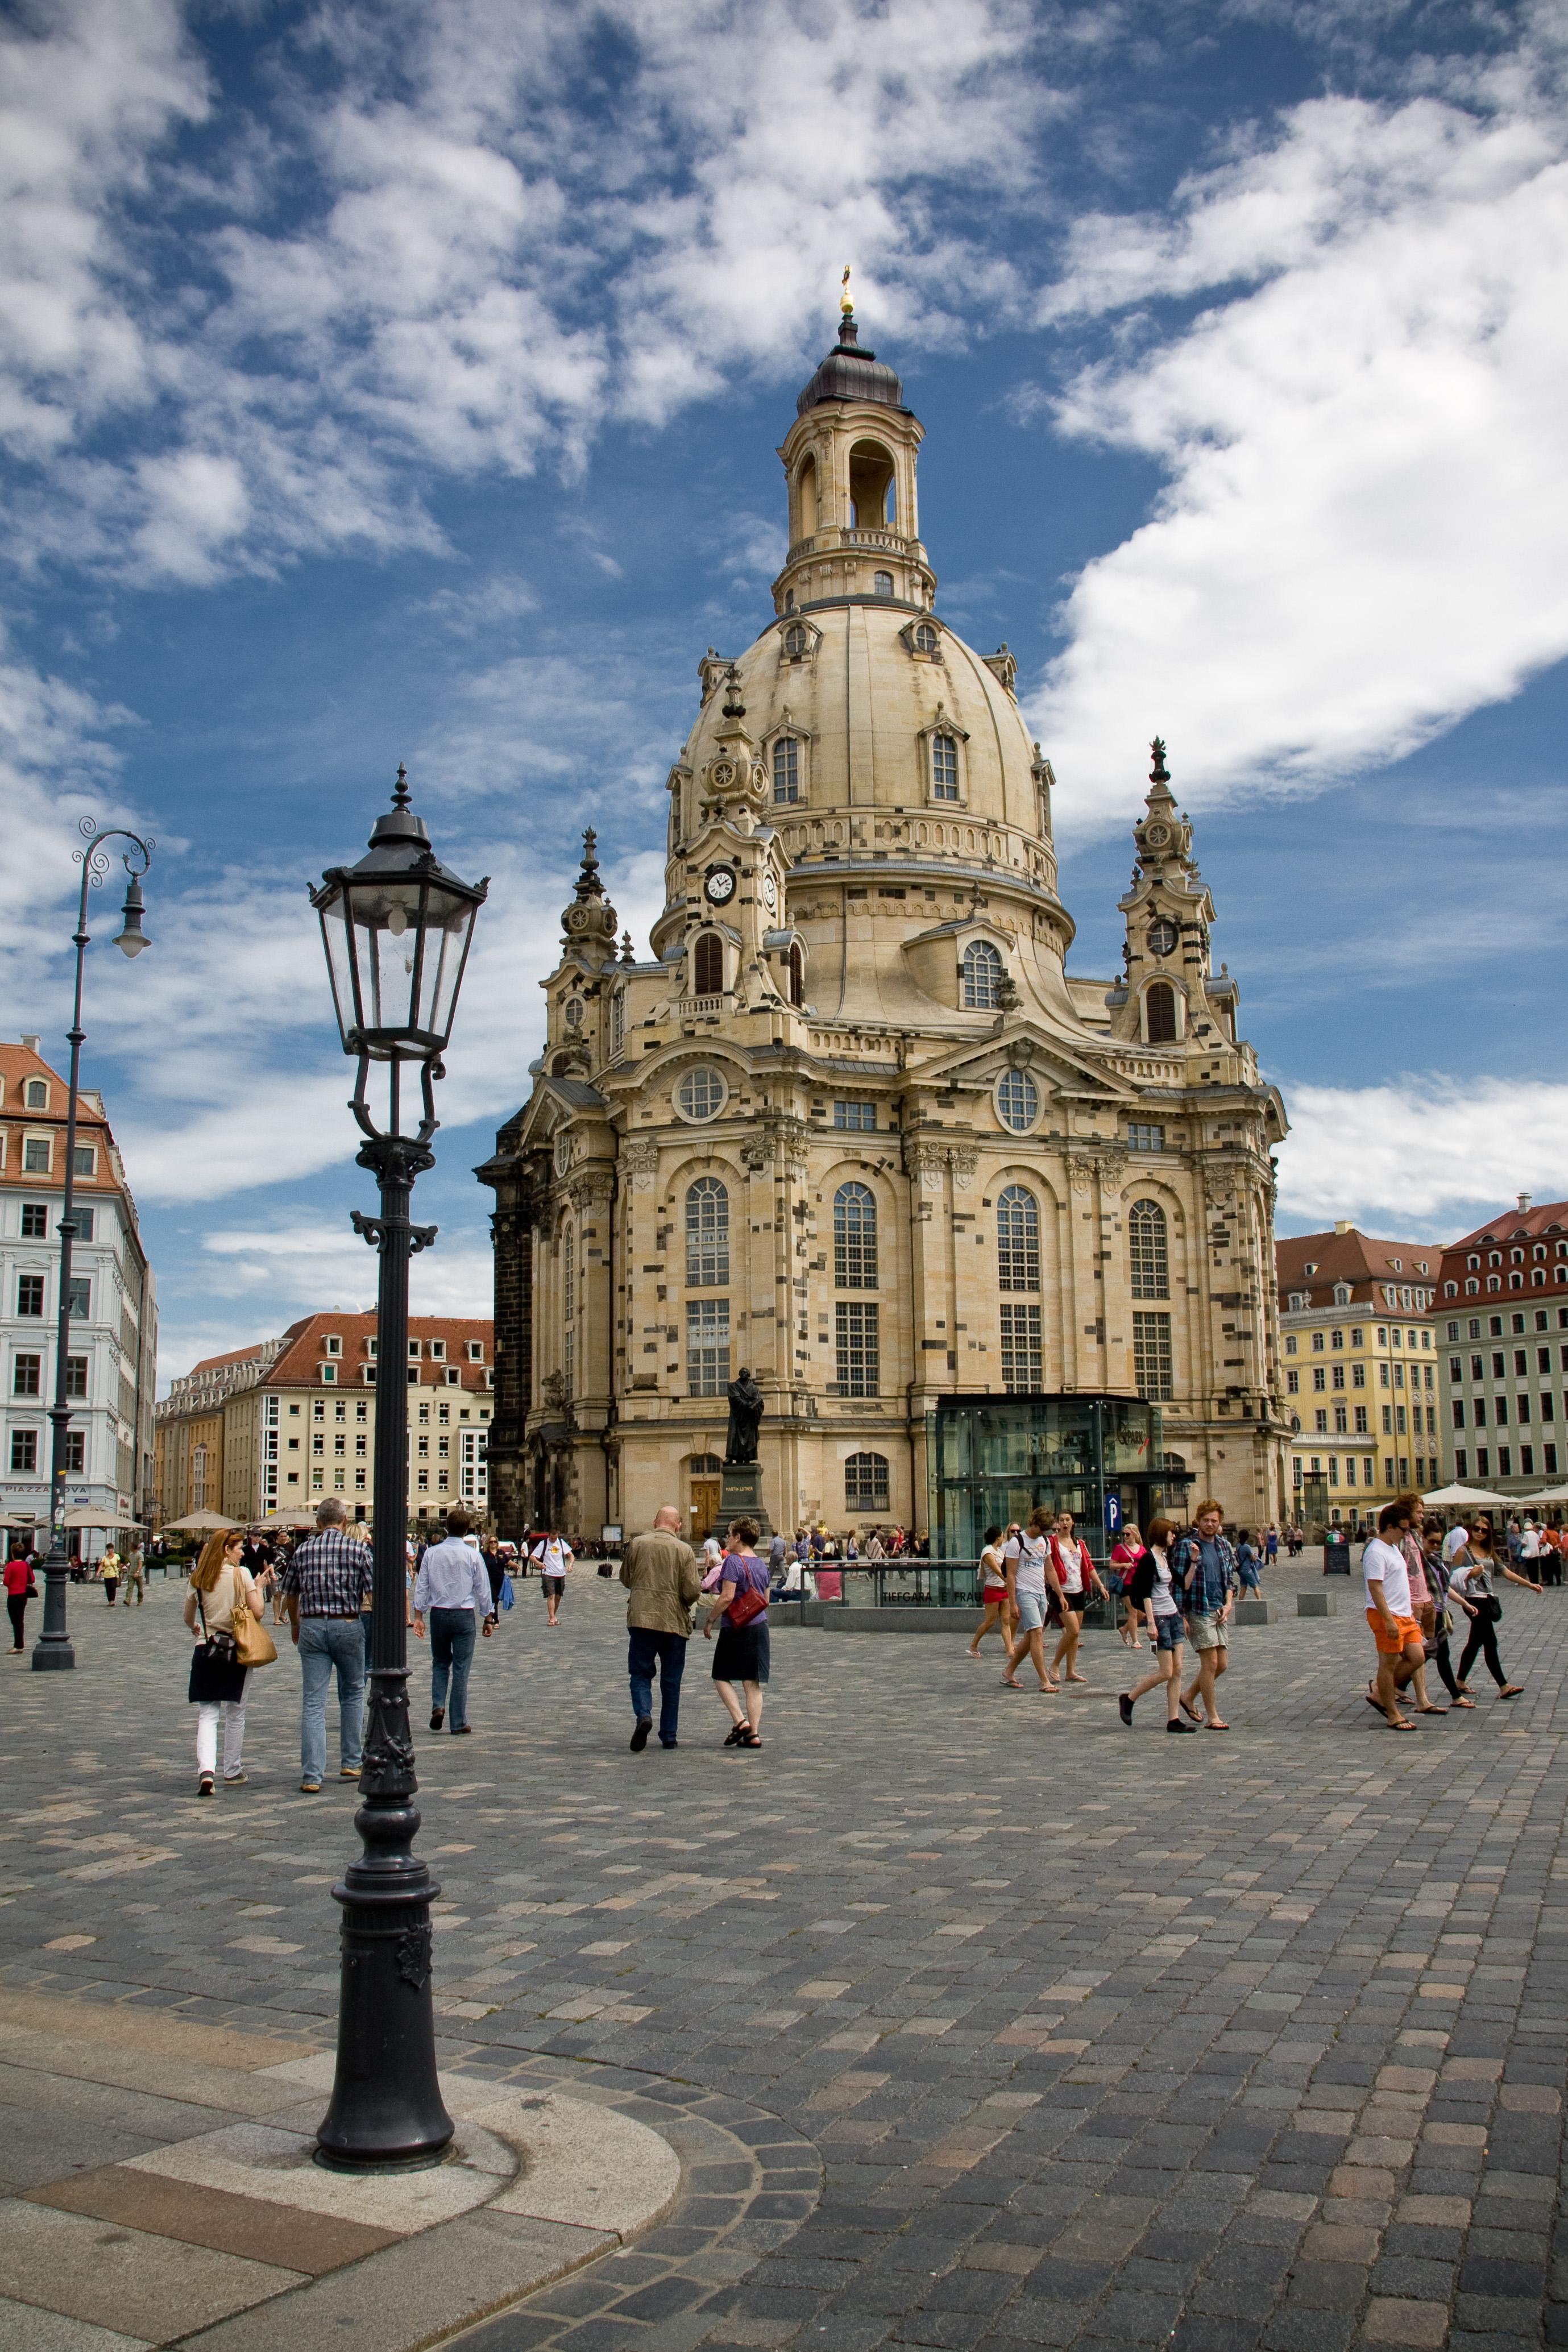 File:Die Frauenkirche in Dresden.jpg - Wikimedia Commons